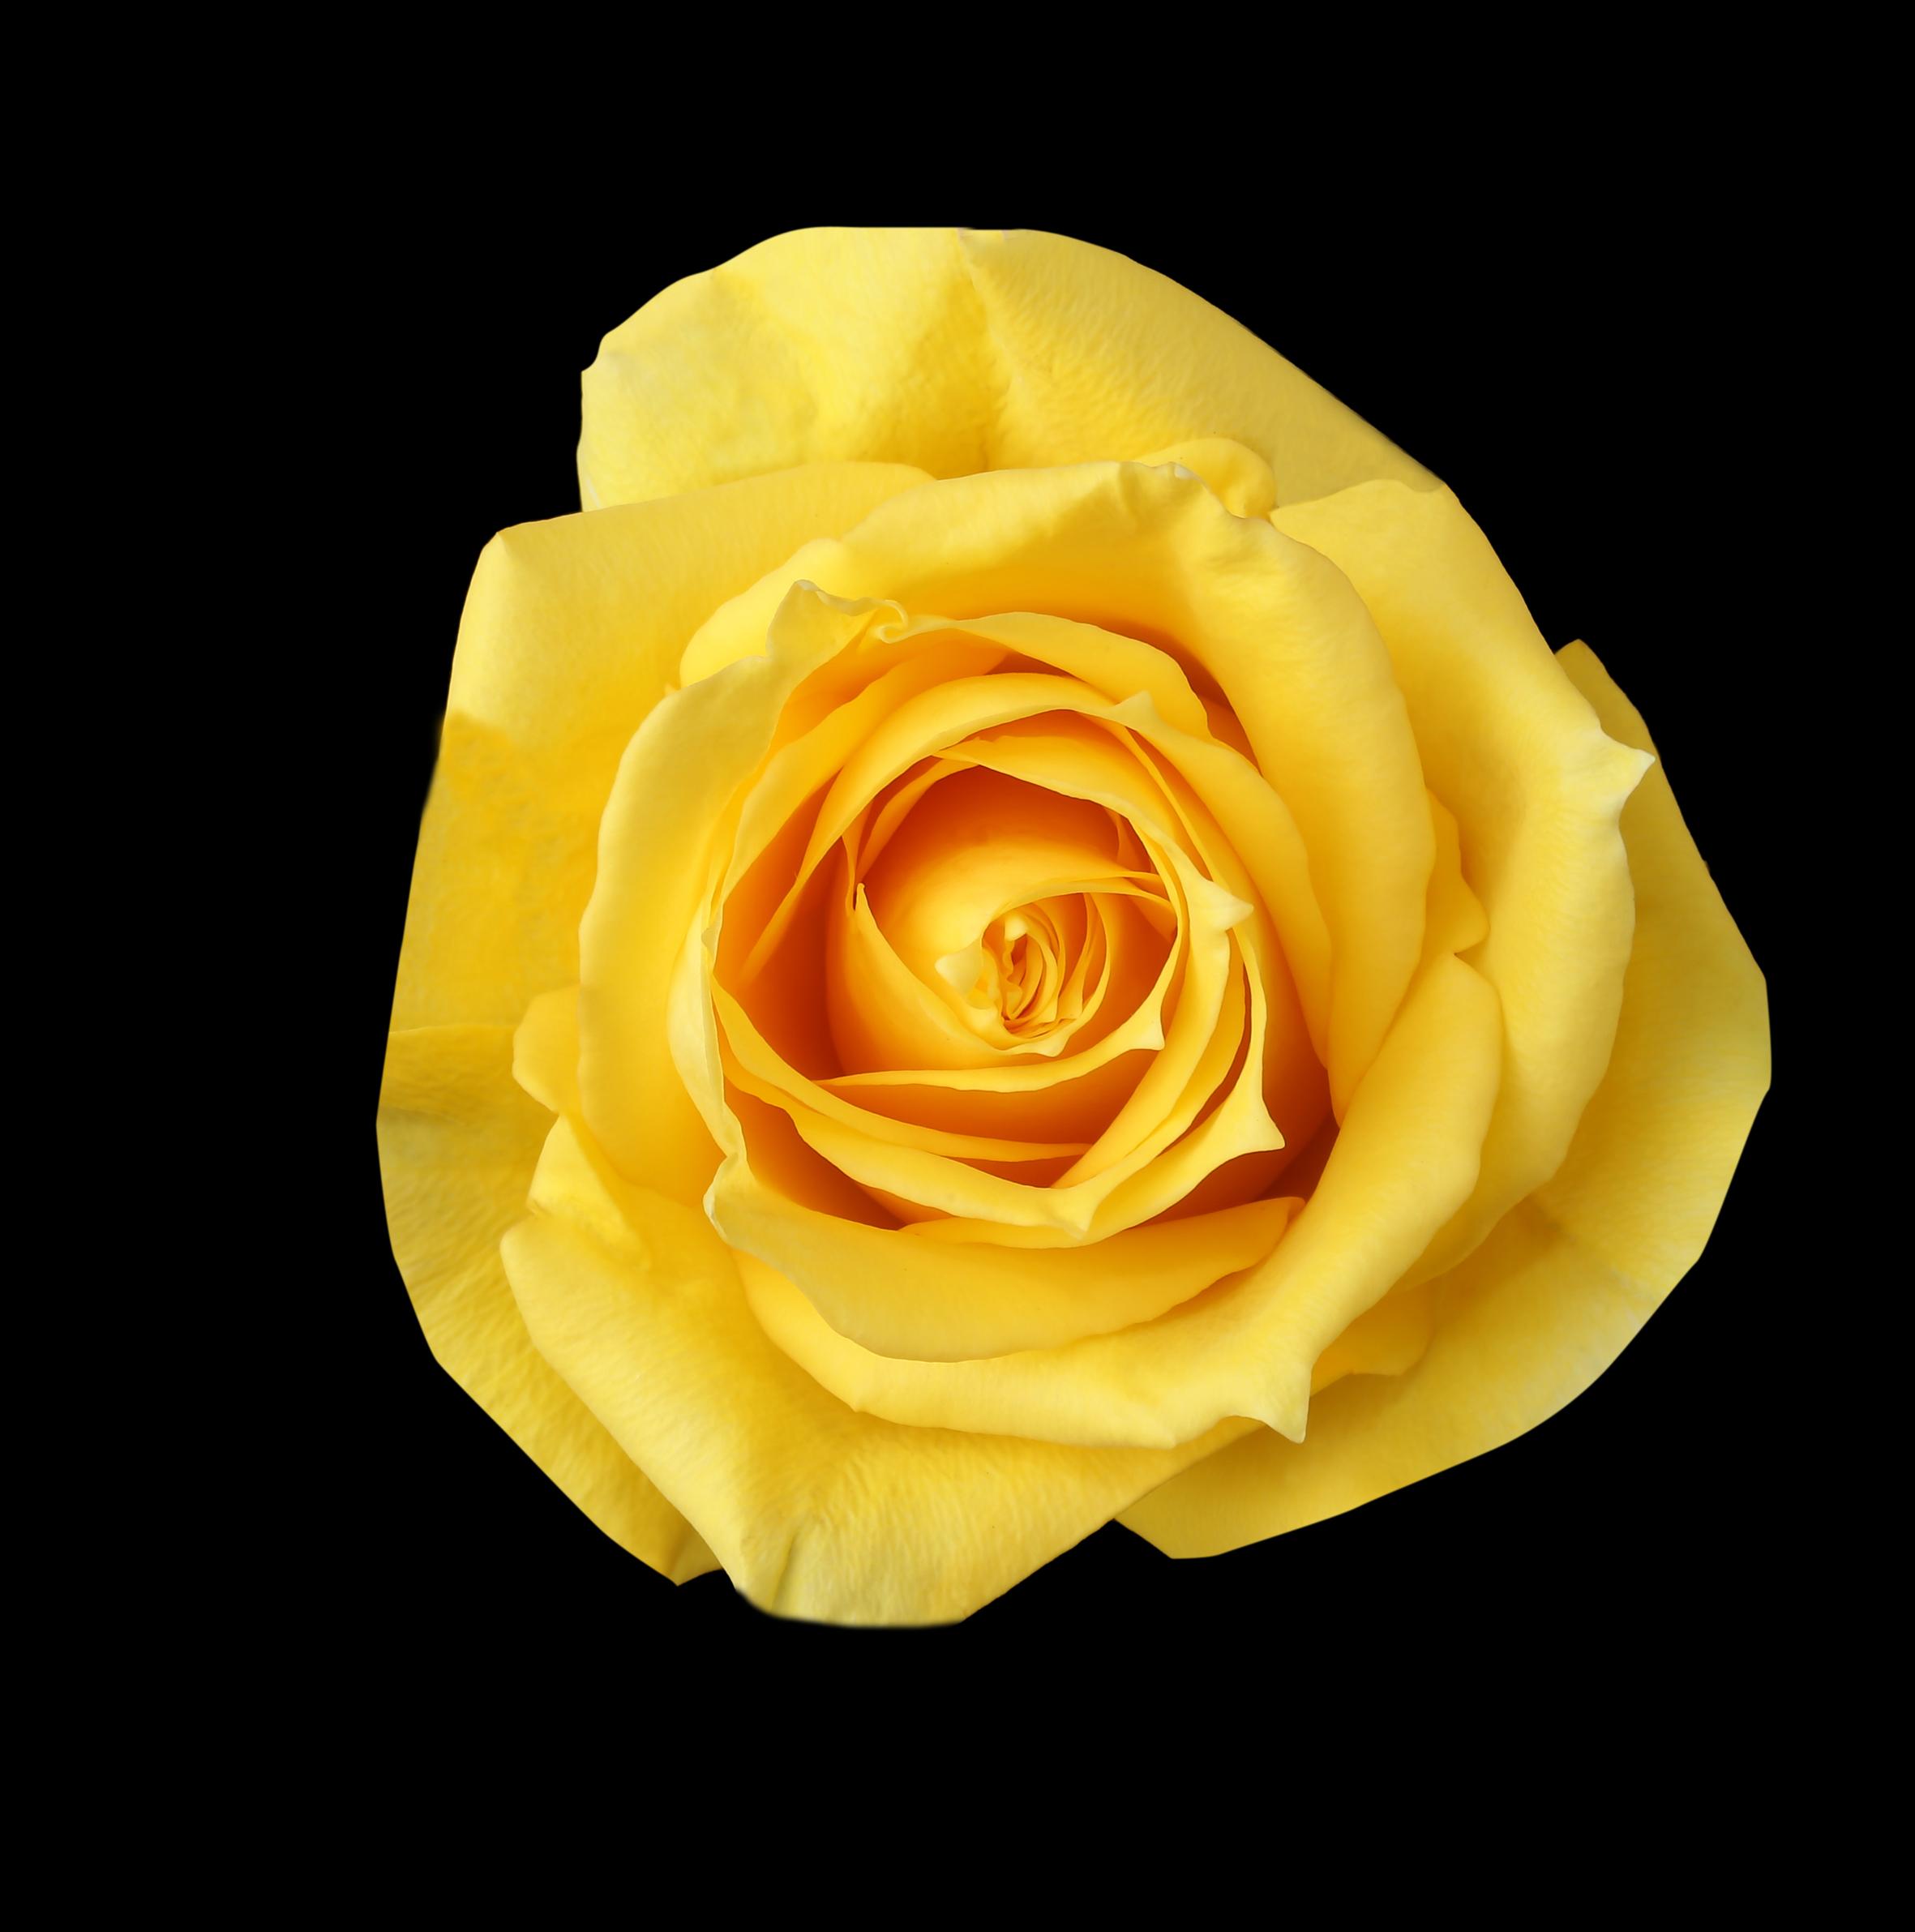 Canary - yellow